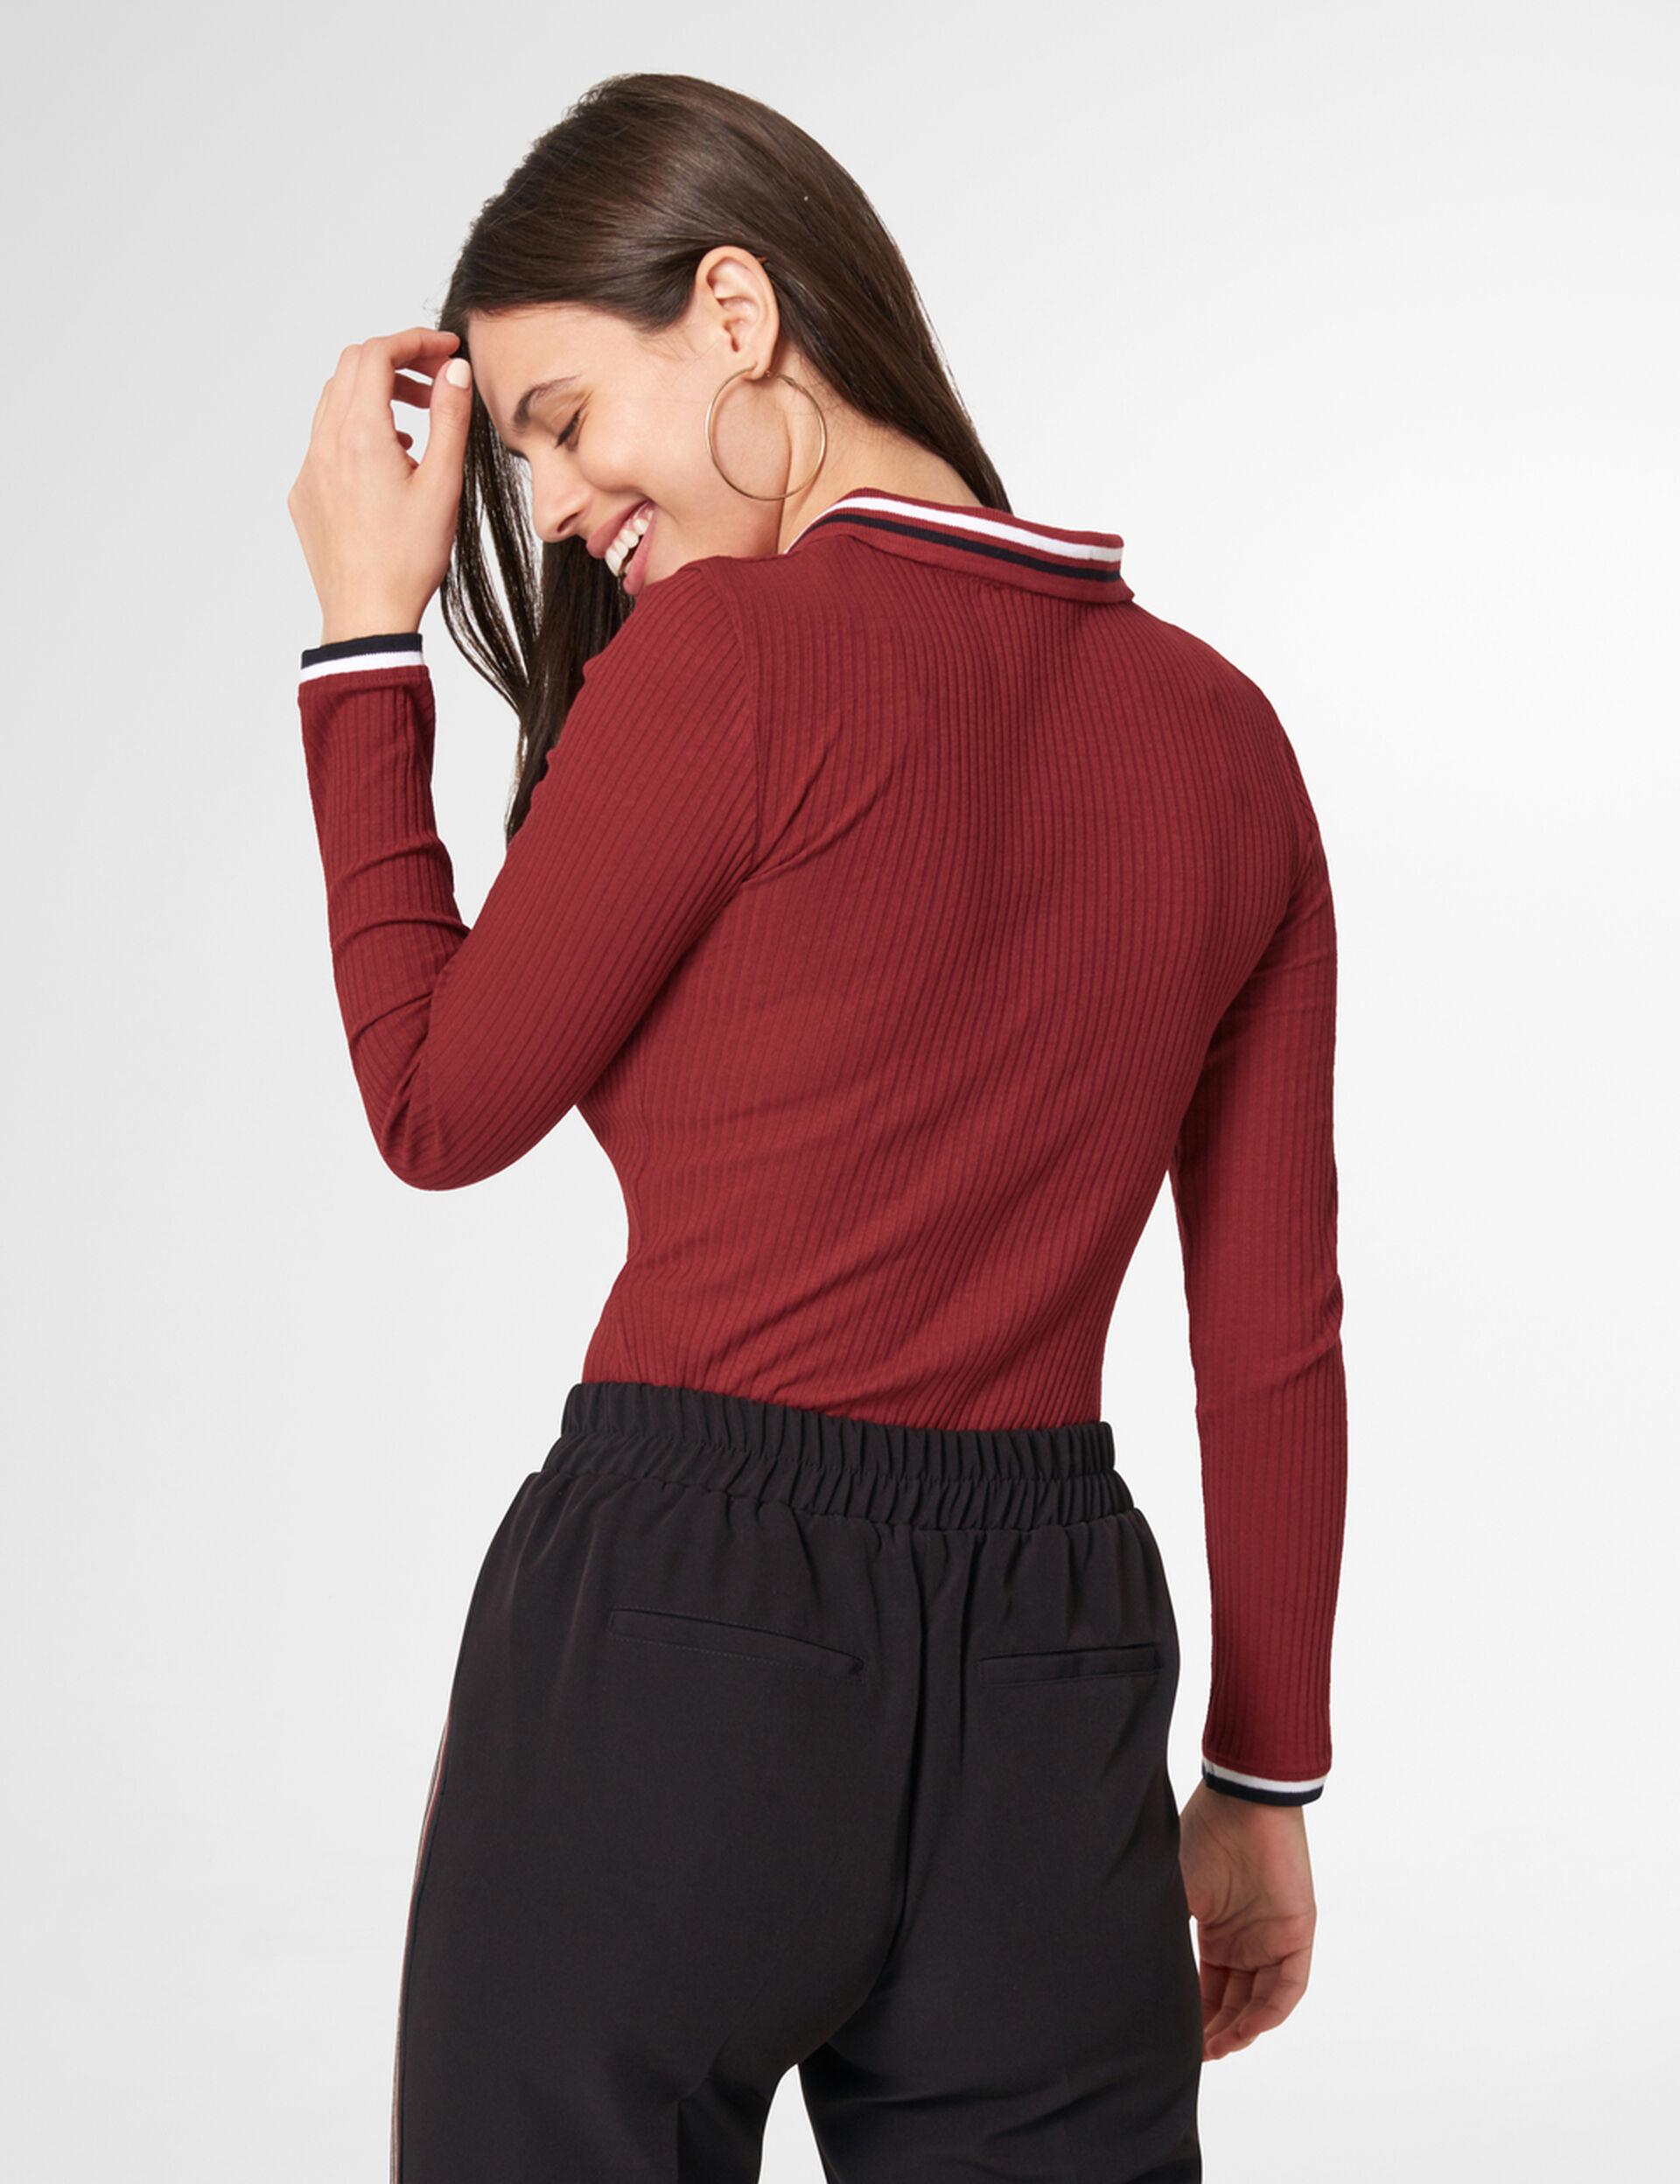 Burgundy polo shirt-style top